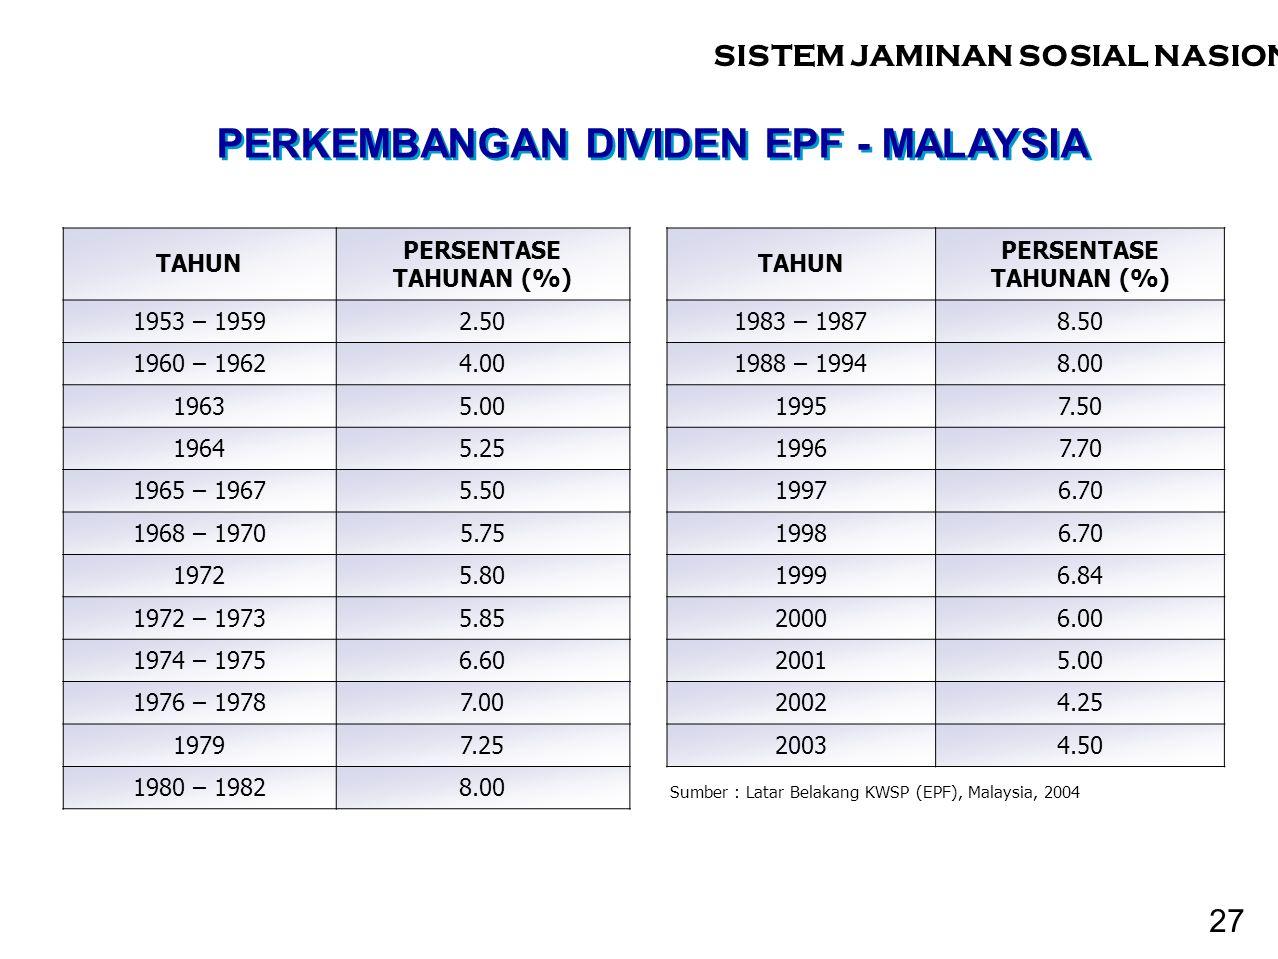 PERKEMBANGAN DIVIDEN EPF - MALAYSIA TAHUN PERSENTASE TAHUNAN (%) 1953 – 19592.50 1960 – 19624.00 19635.00 19645.25 1965 – 19675.50 1968 – 19705.75 197